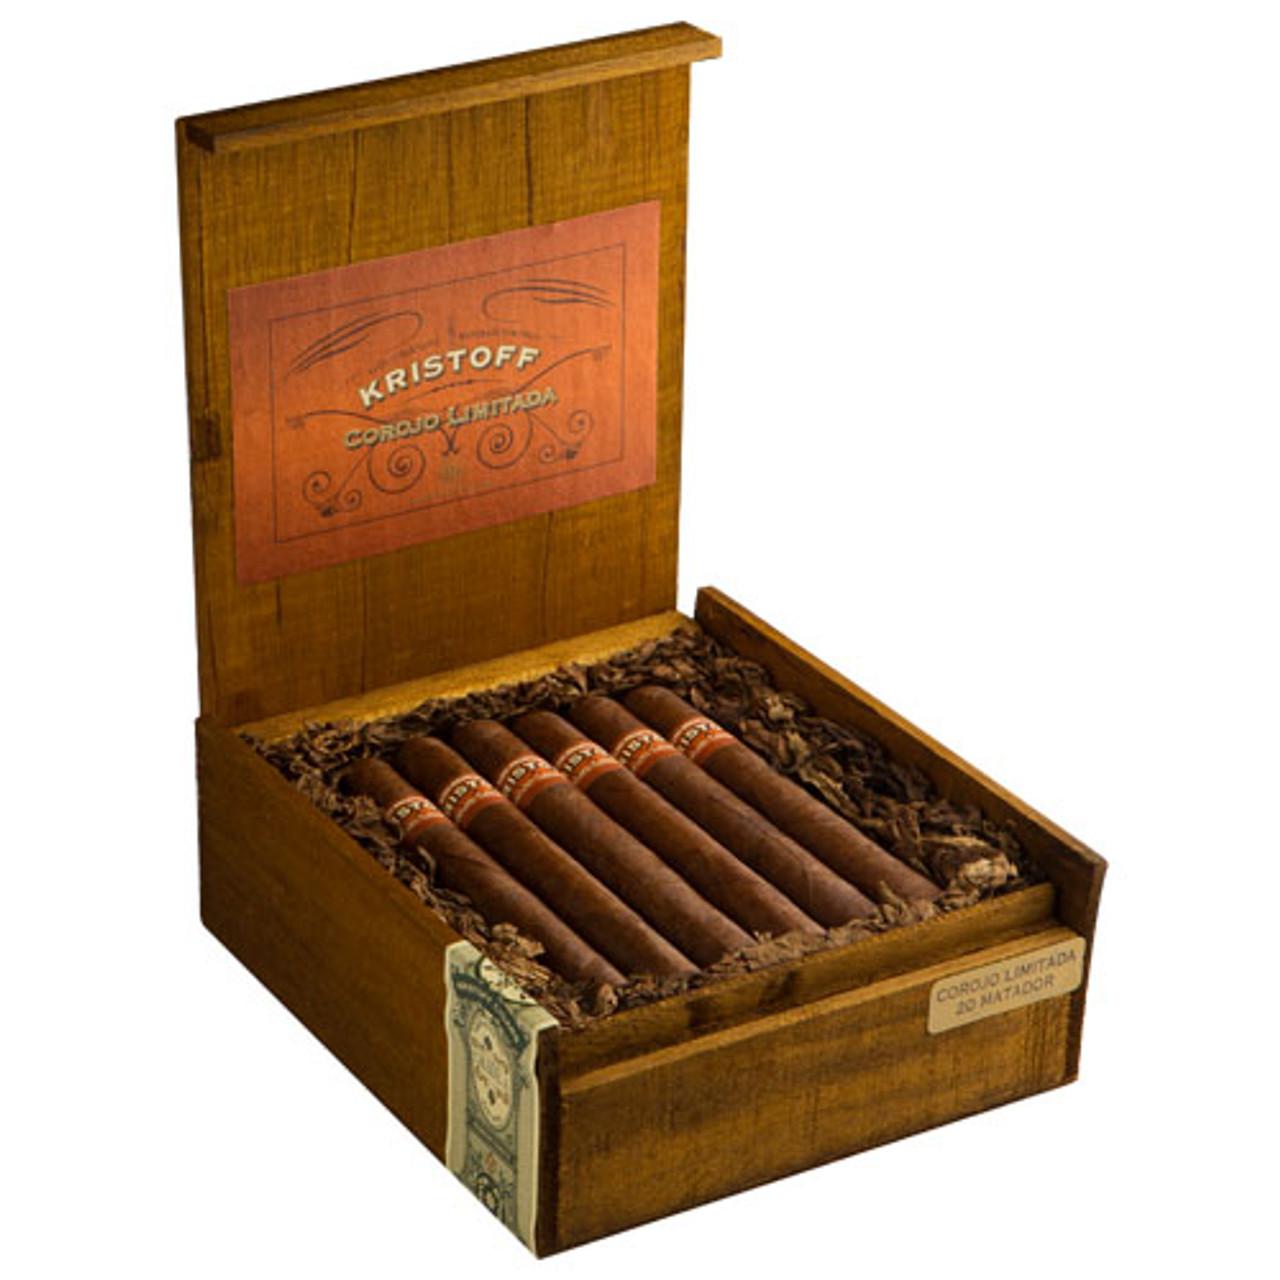 Kristoff Corojo Limitada Matador Cigars - 6.5 x 56 (Box of 20)